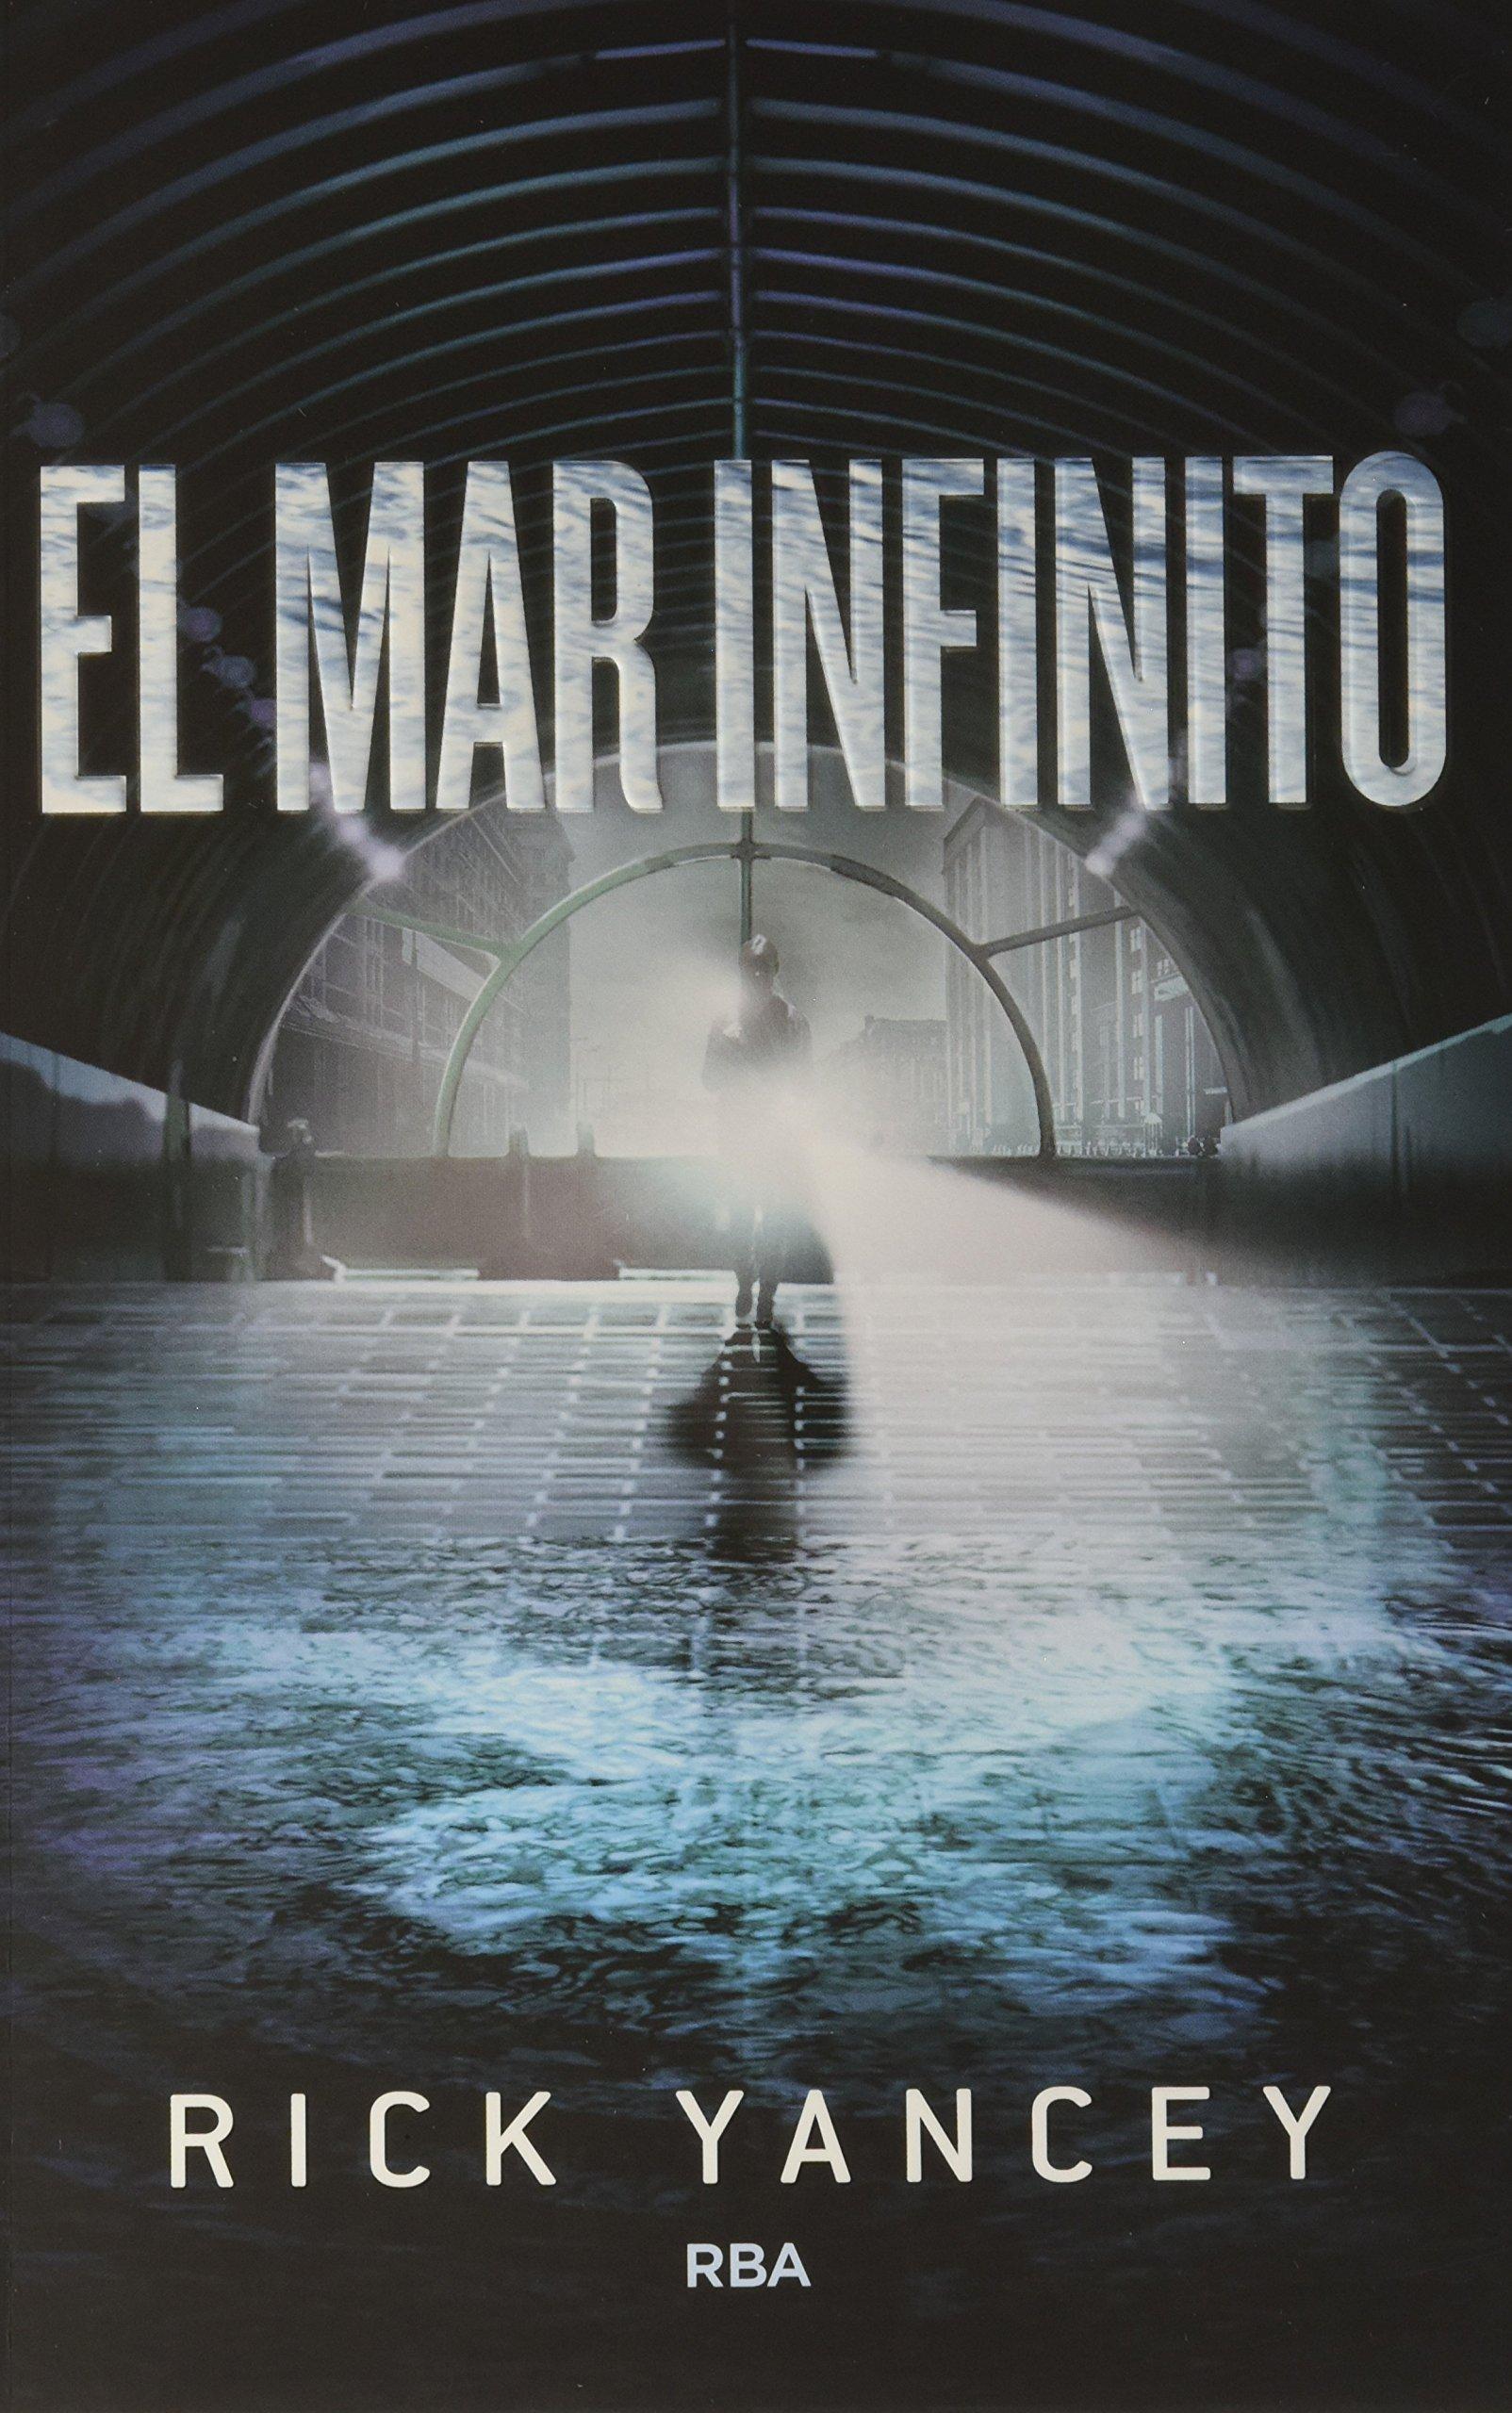 Amazon.com: Mar infinito (Spanish Edition) (9788427208278): Rick Yancey, Molino-RBA: Books